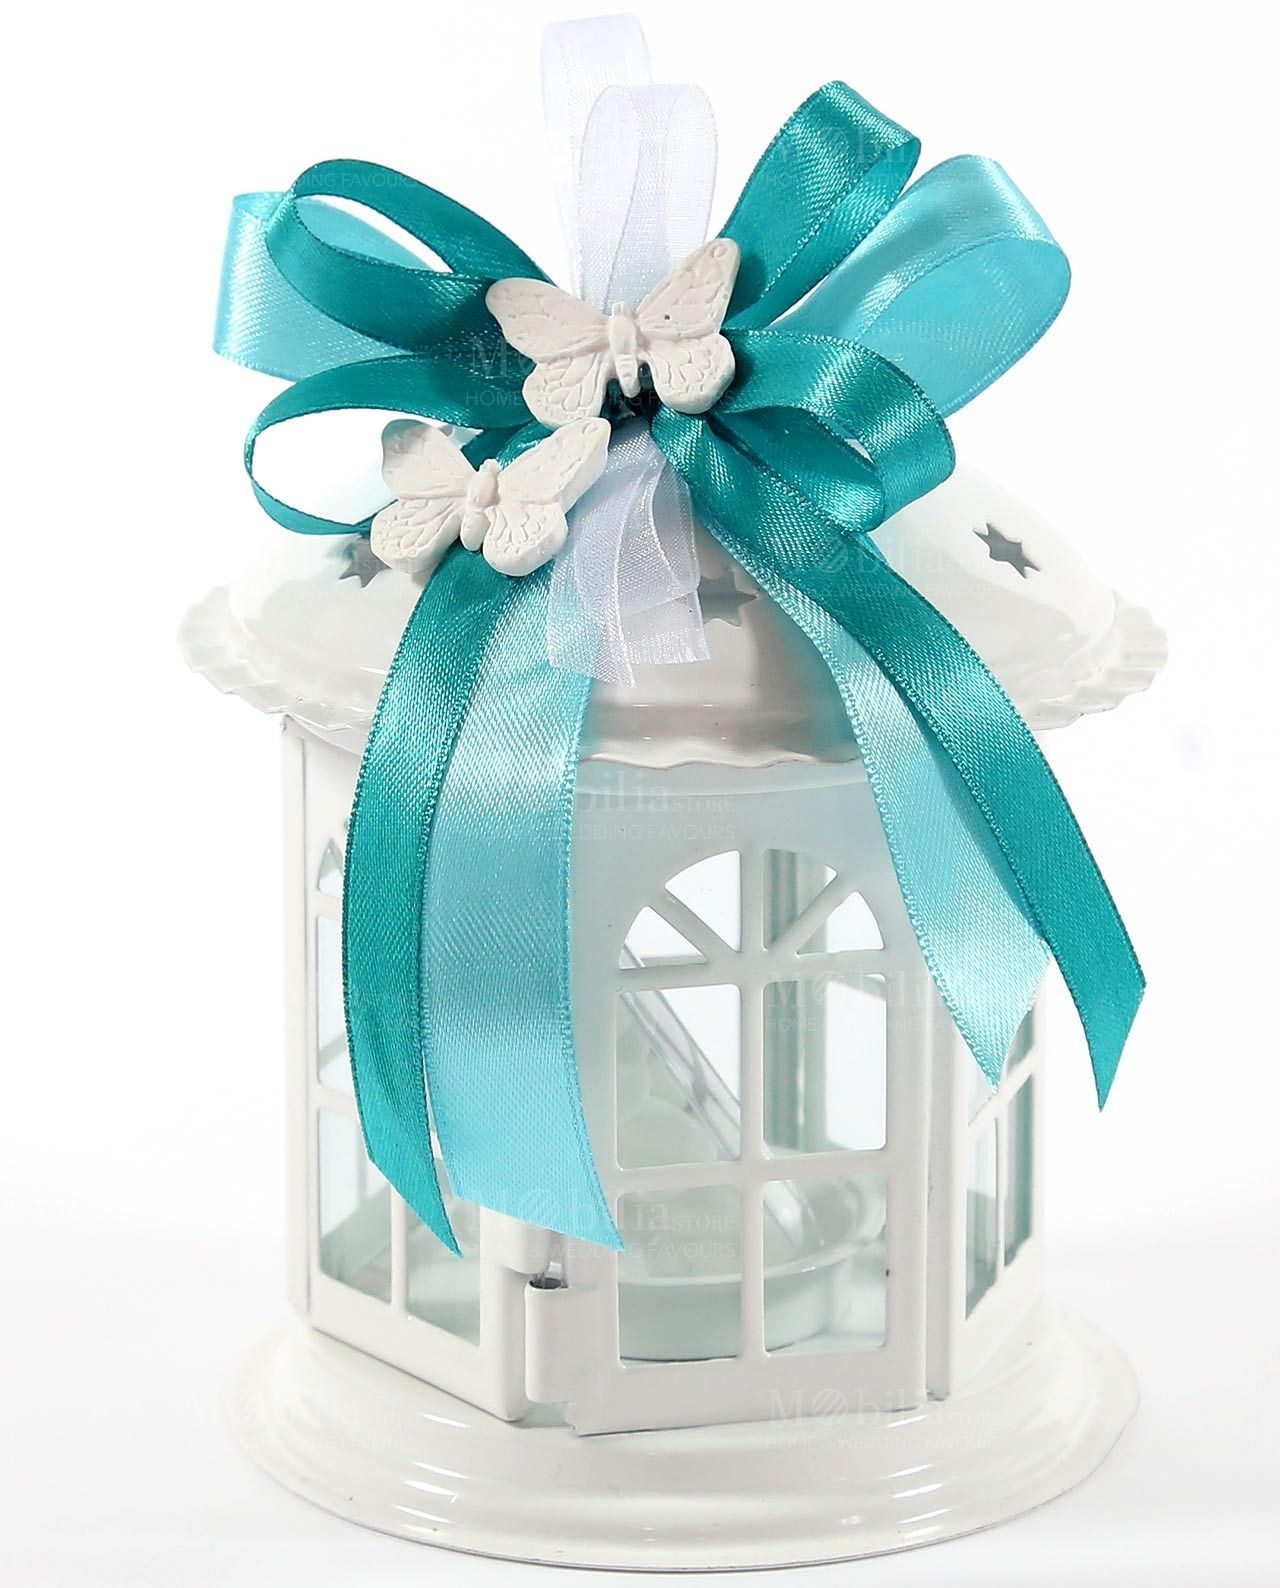 Bomboniere Matrimonio Con Farfalle.Lanterne Bomboniere Con Farfalle Con Bellissime Stelle Intagliate